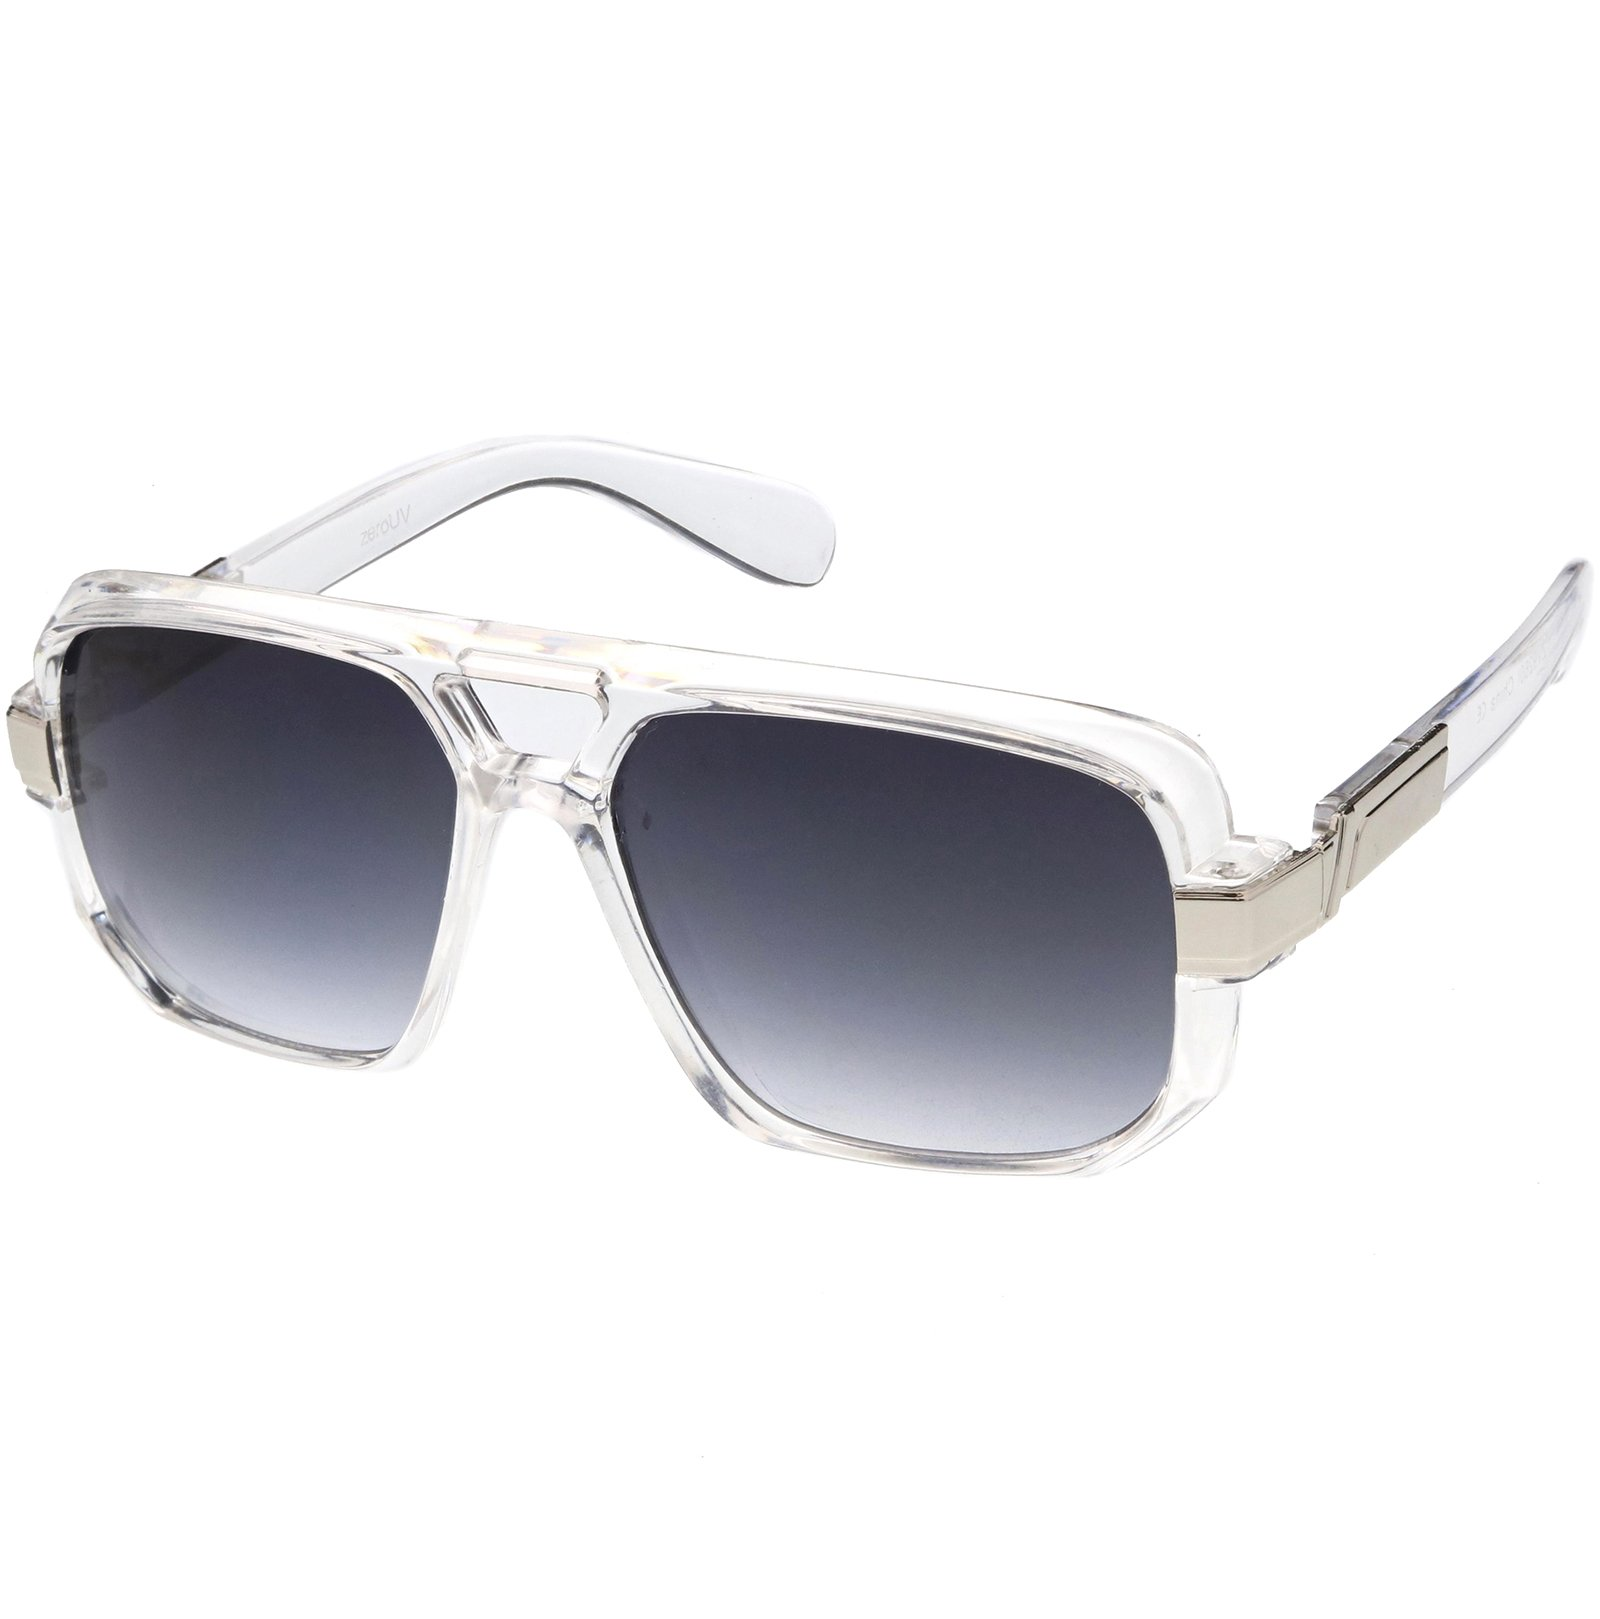 Classic Square Frame Plastic Flat Top Aviator Sunglasses (Clear Silver)